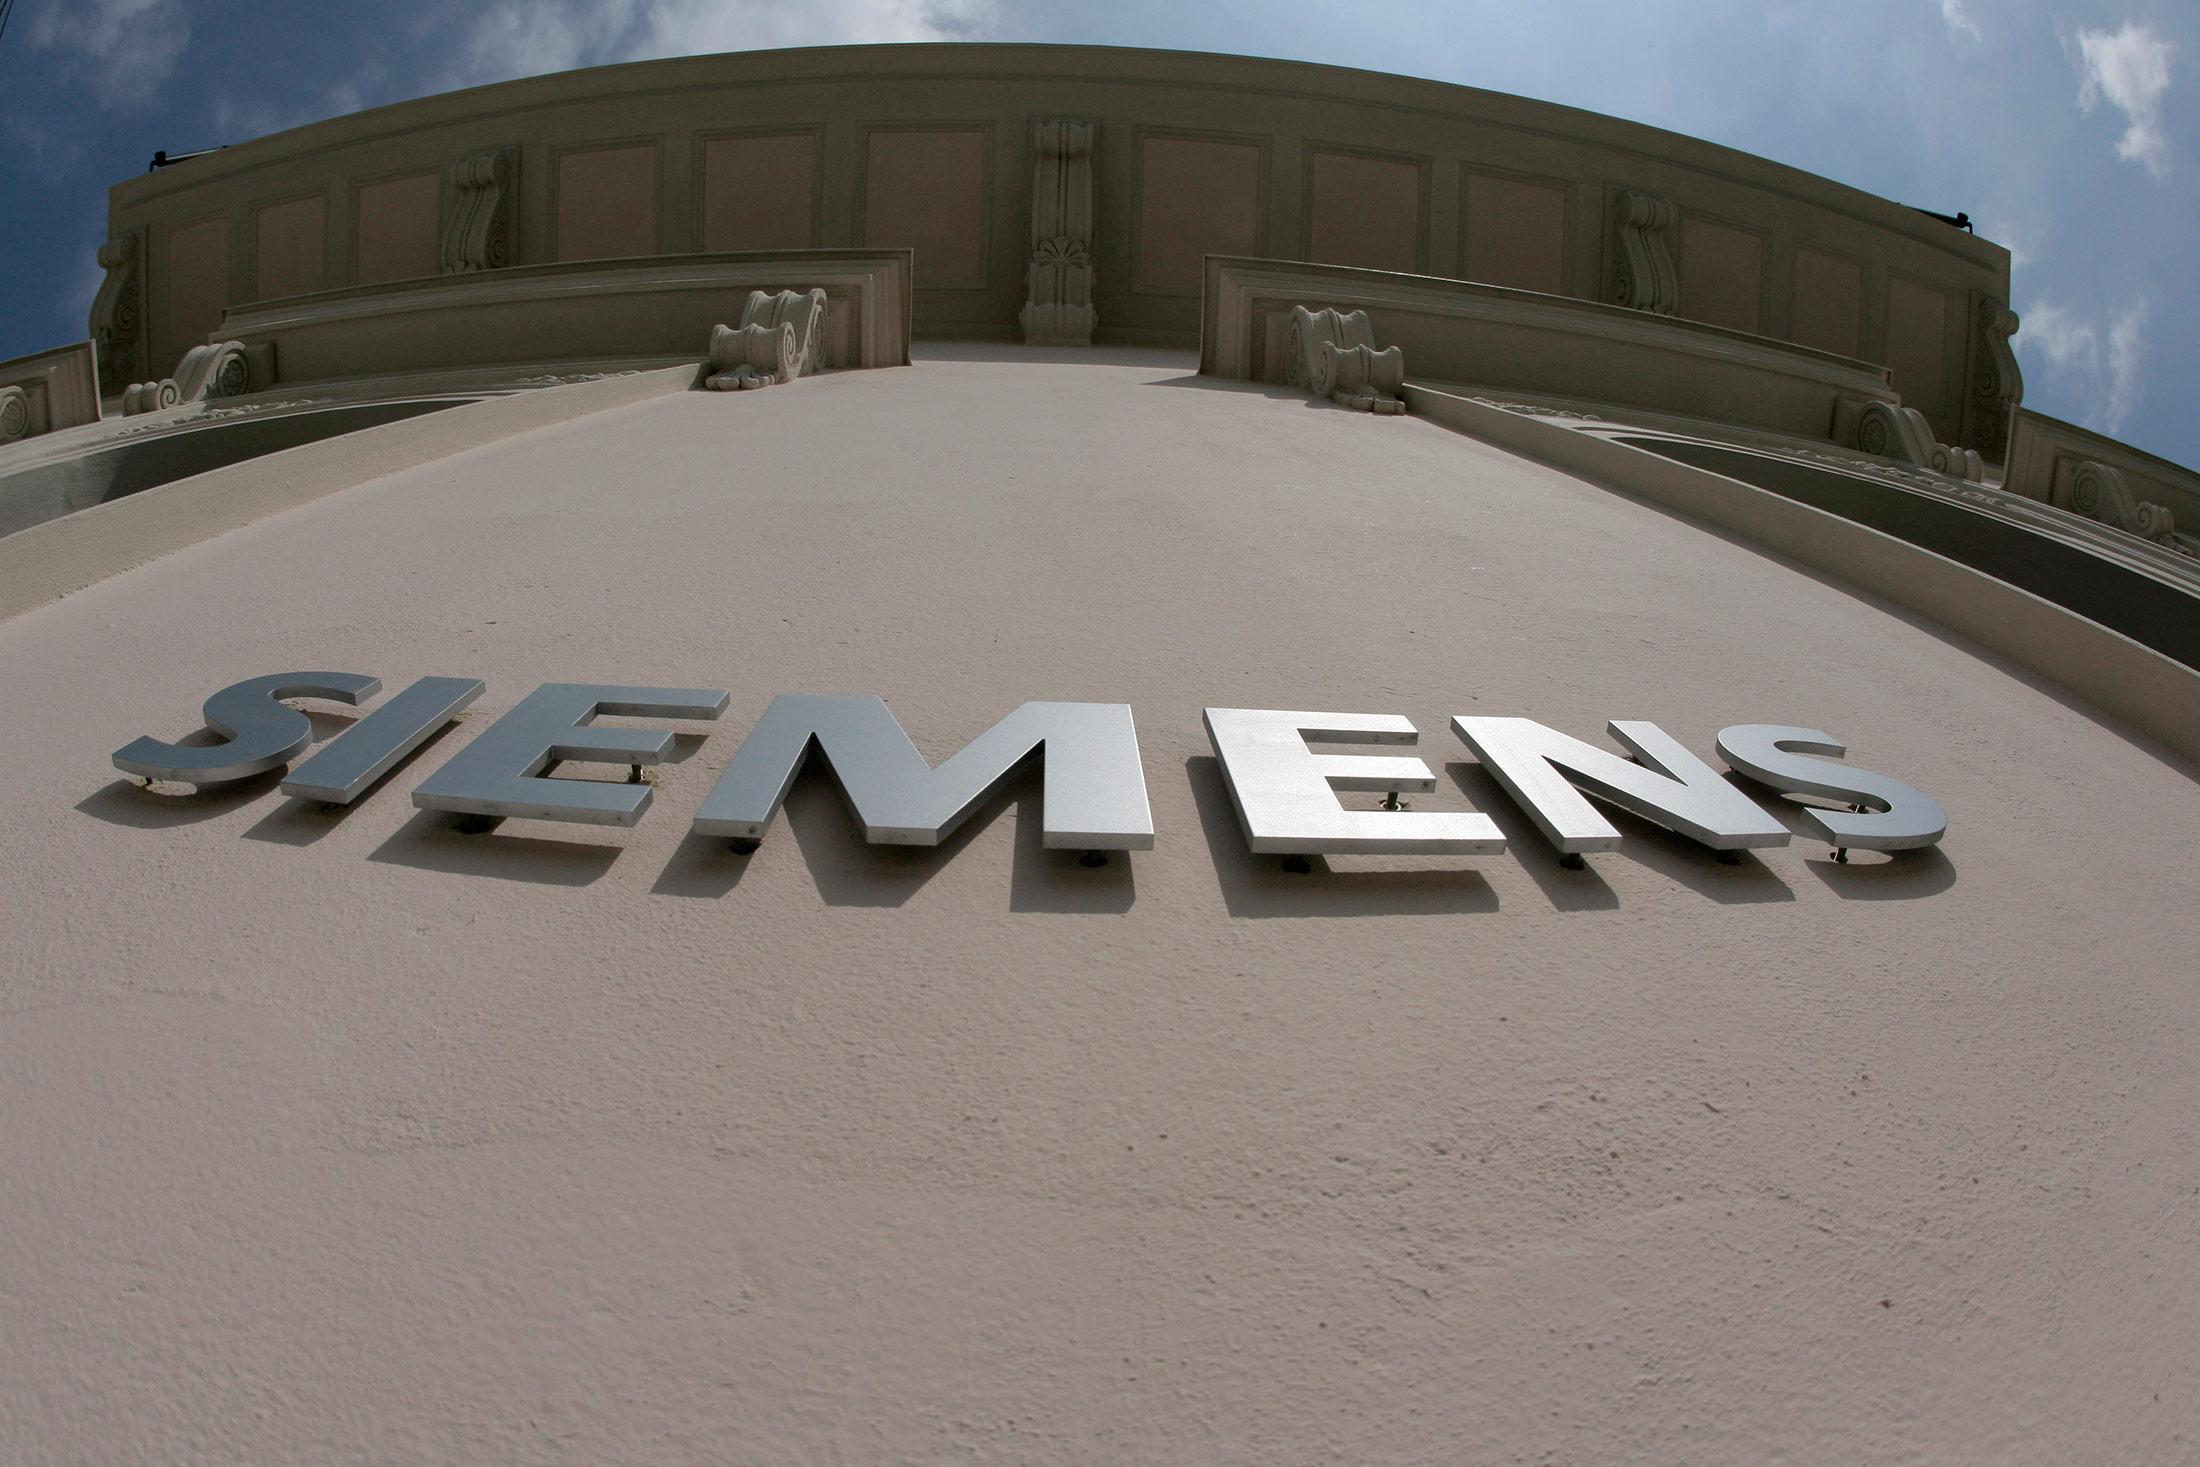 Siemens to Buy U S  Software Maker Mentor for $4 5 Billion - Bloomberg